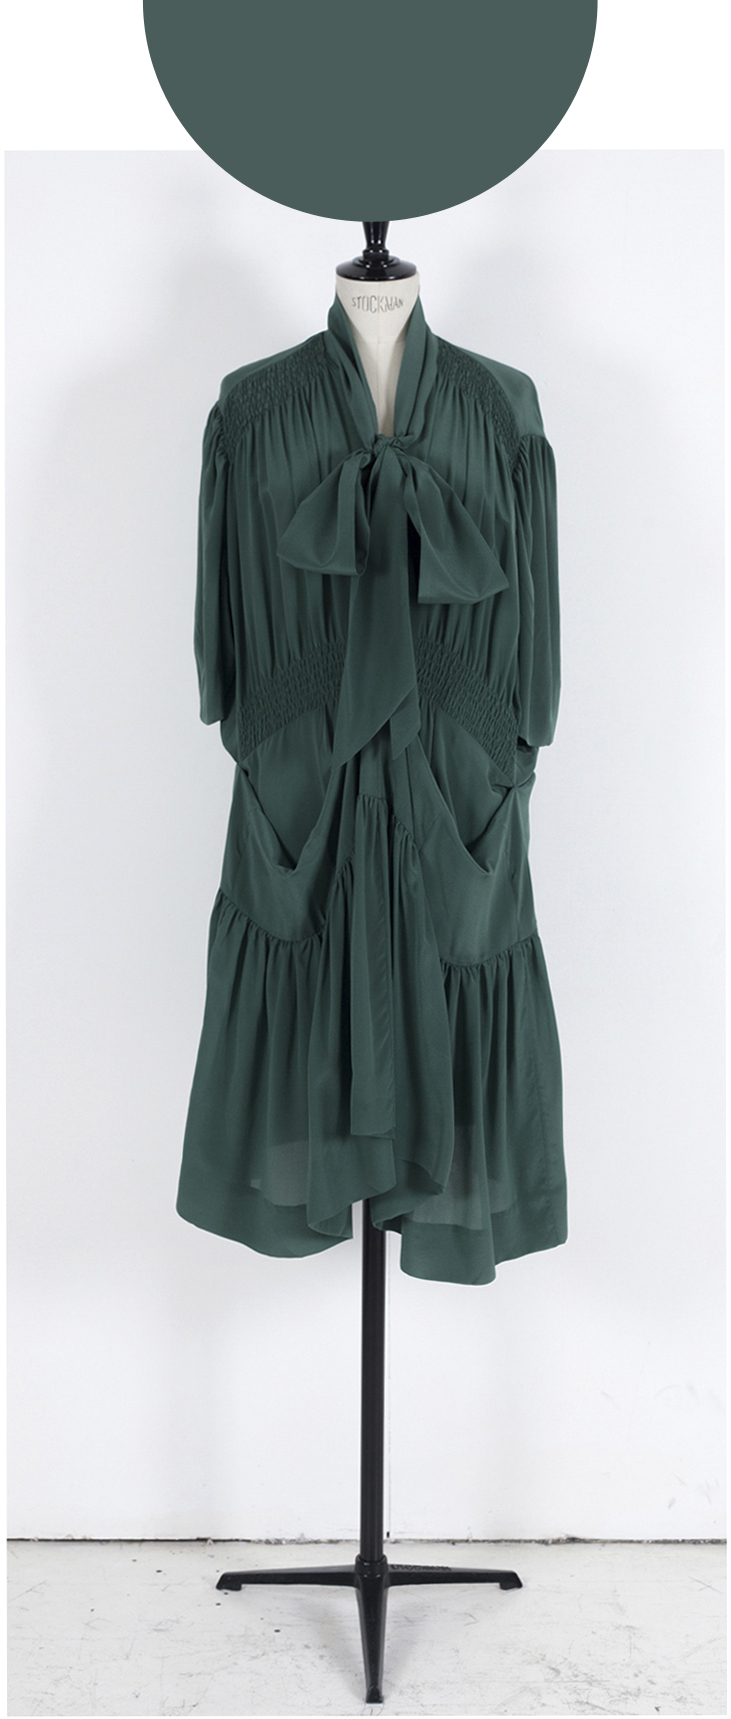 03B MID GREEN/ Short Sleeve Pull up Midi/Maxi Adjustor Dress